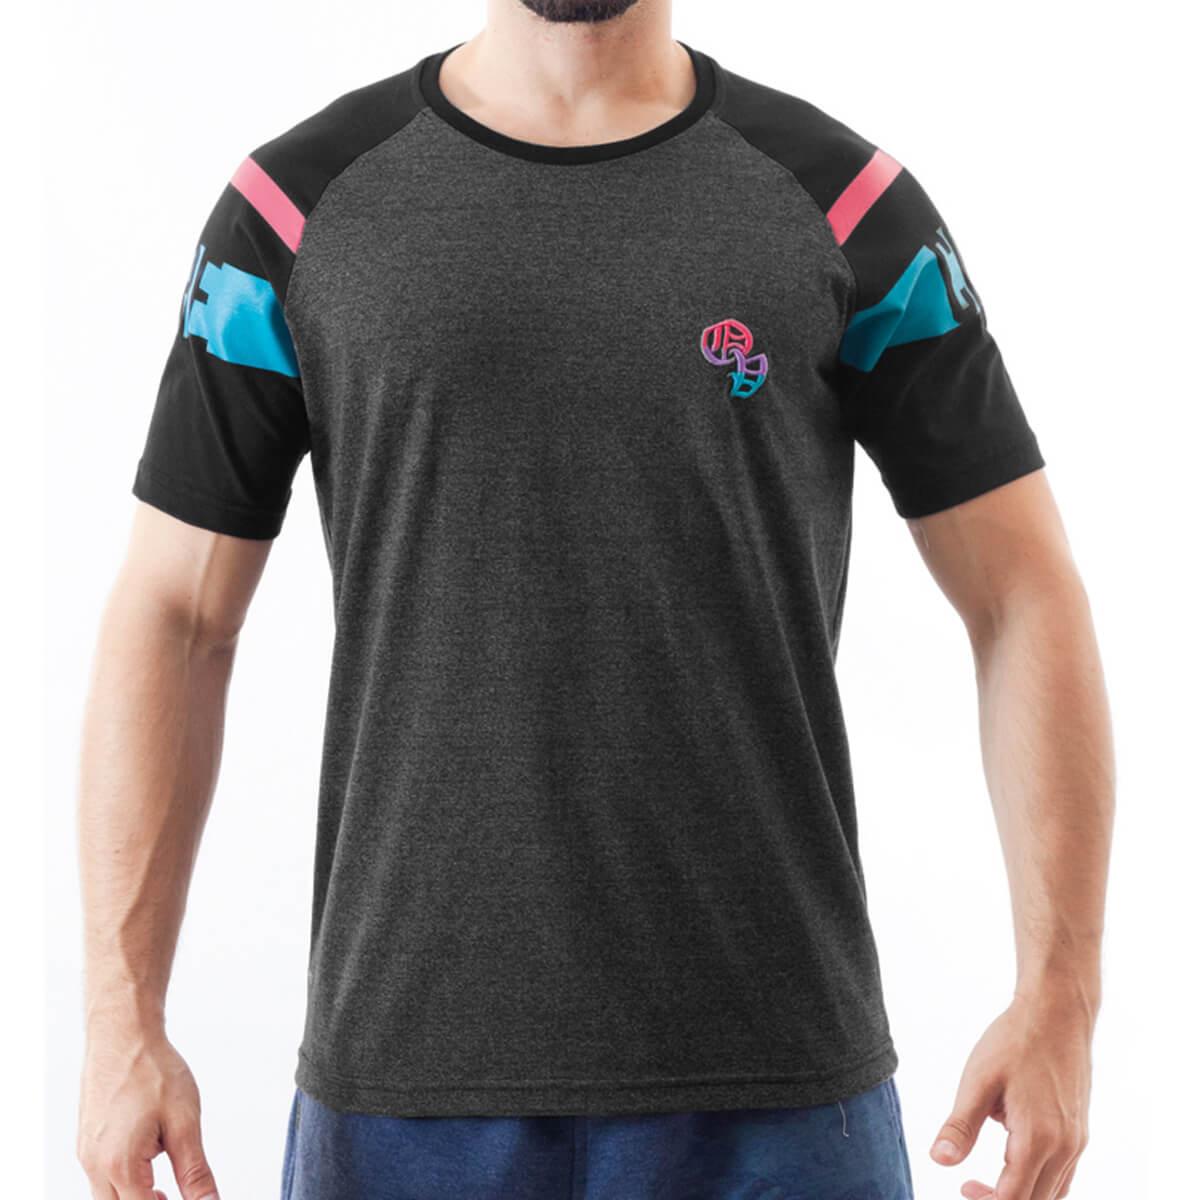 Camiseta Masculina Estampada Neon